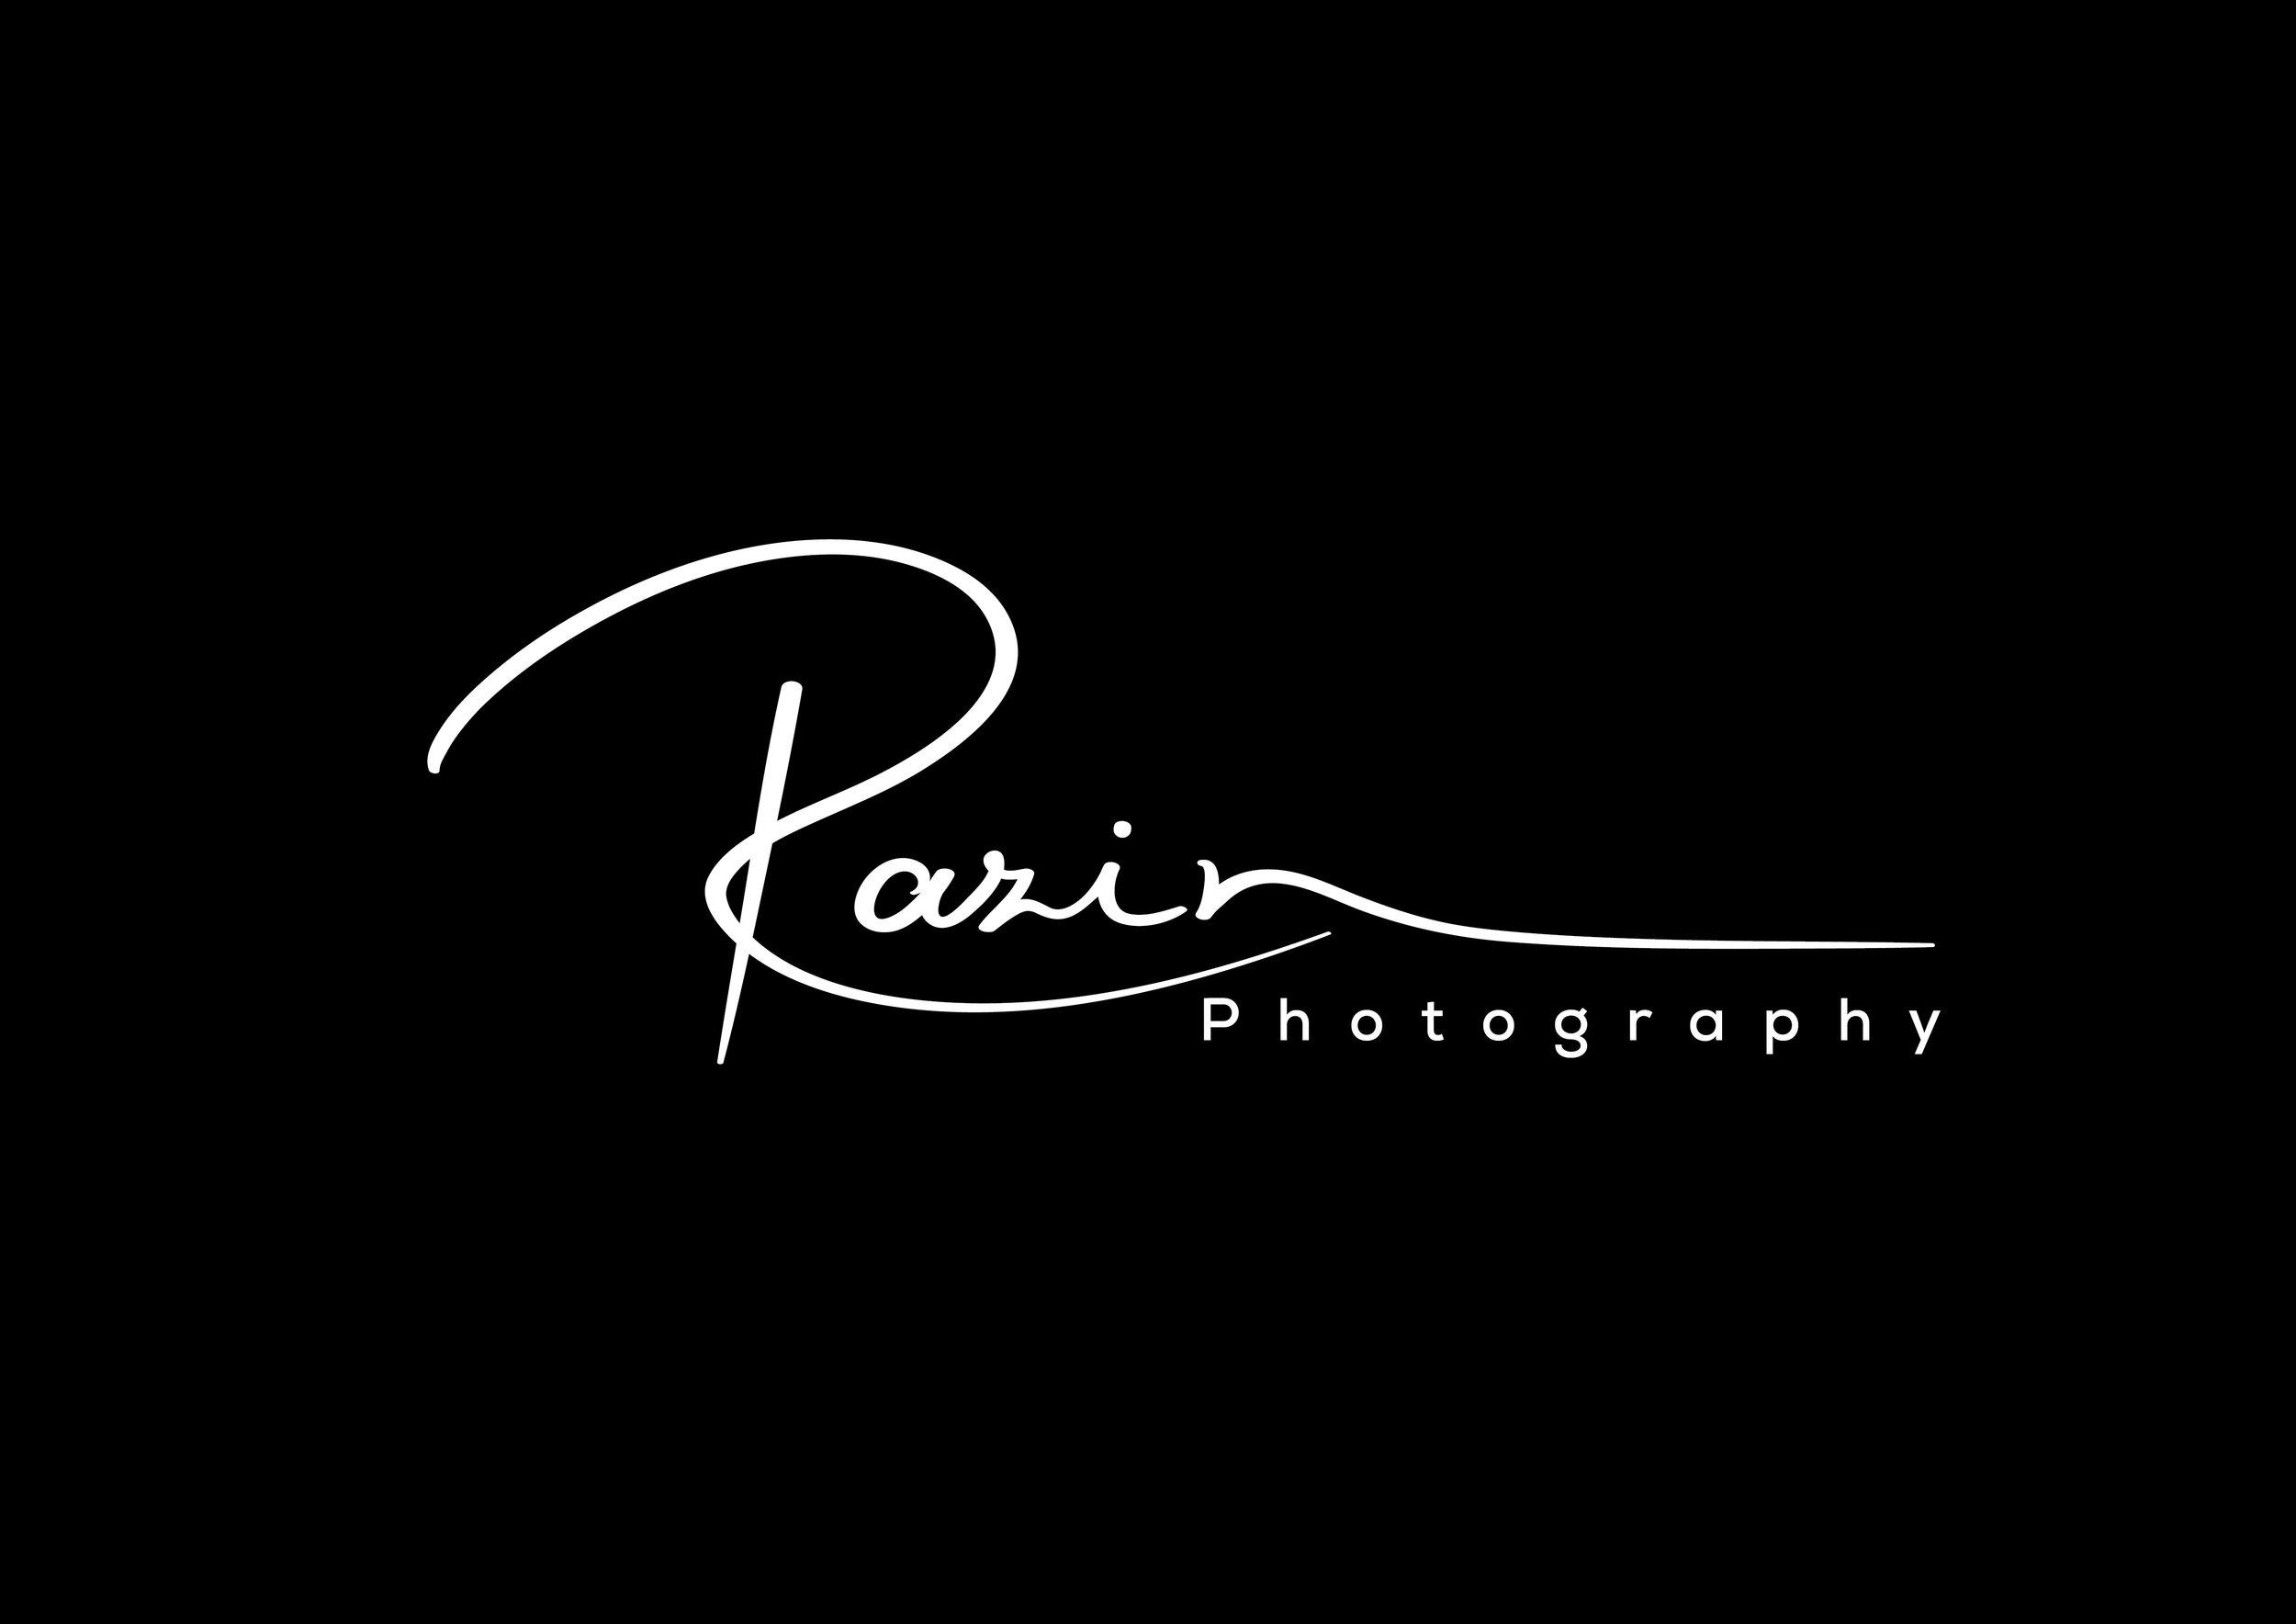 razin photography logo 2017